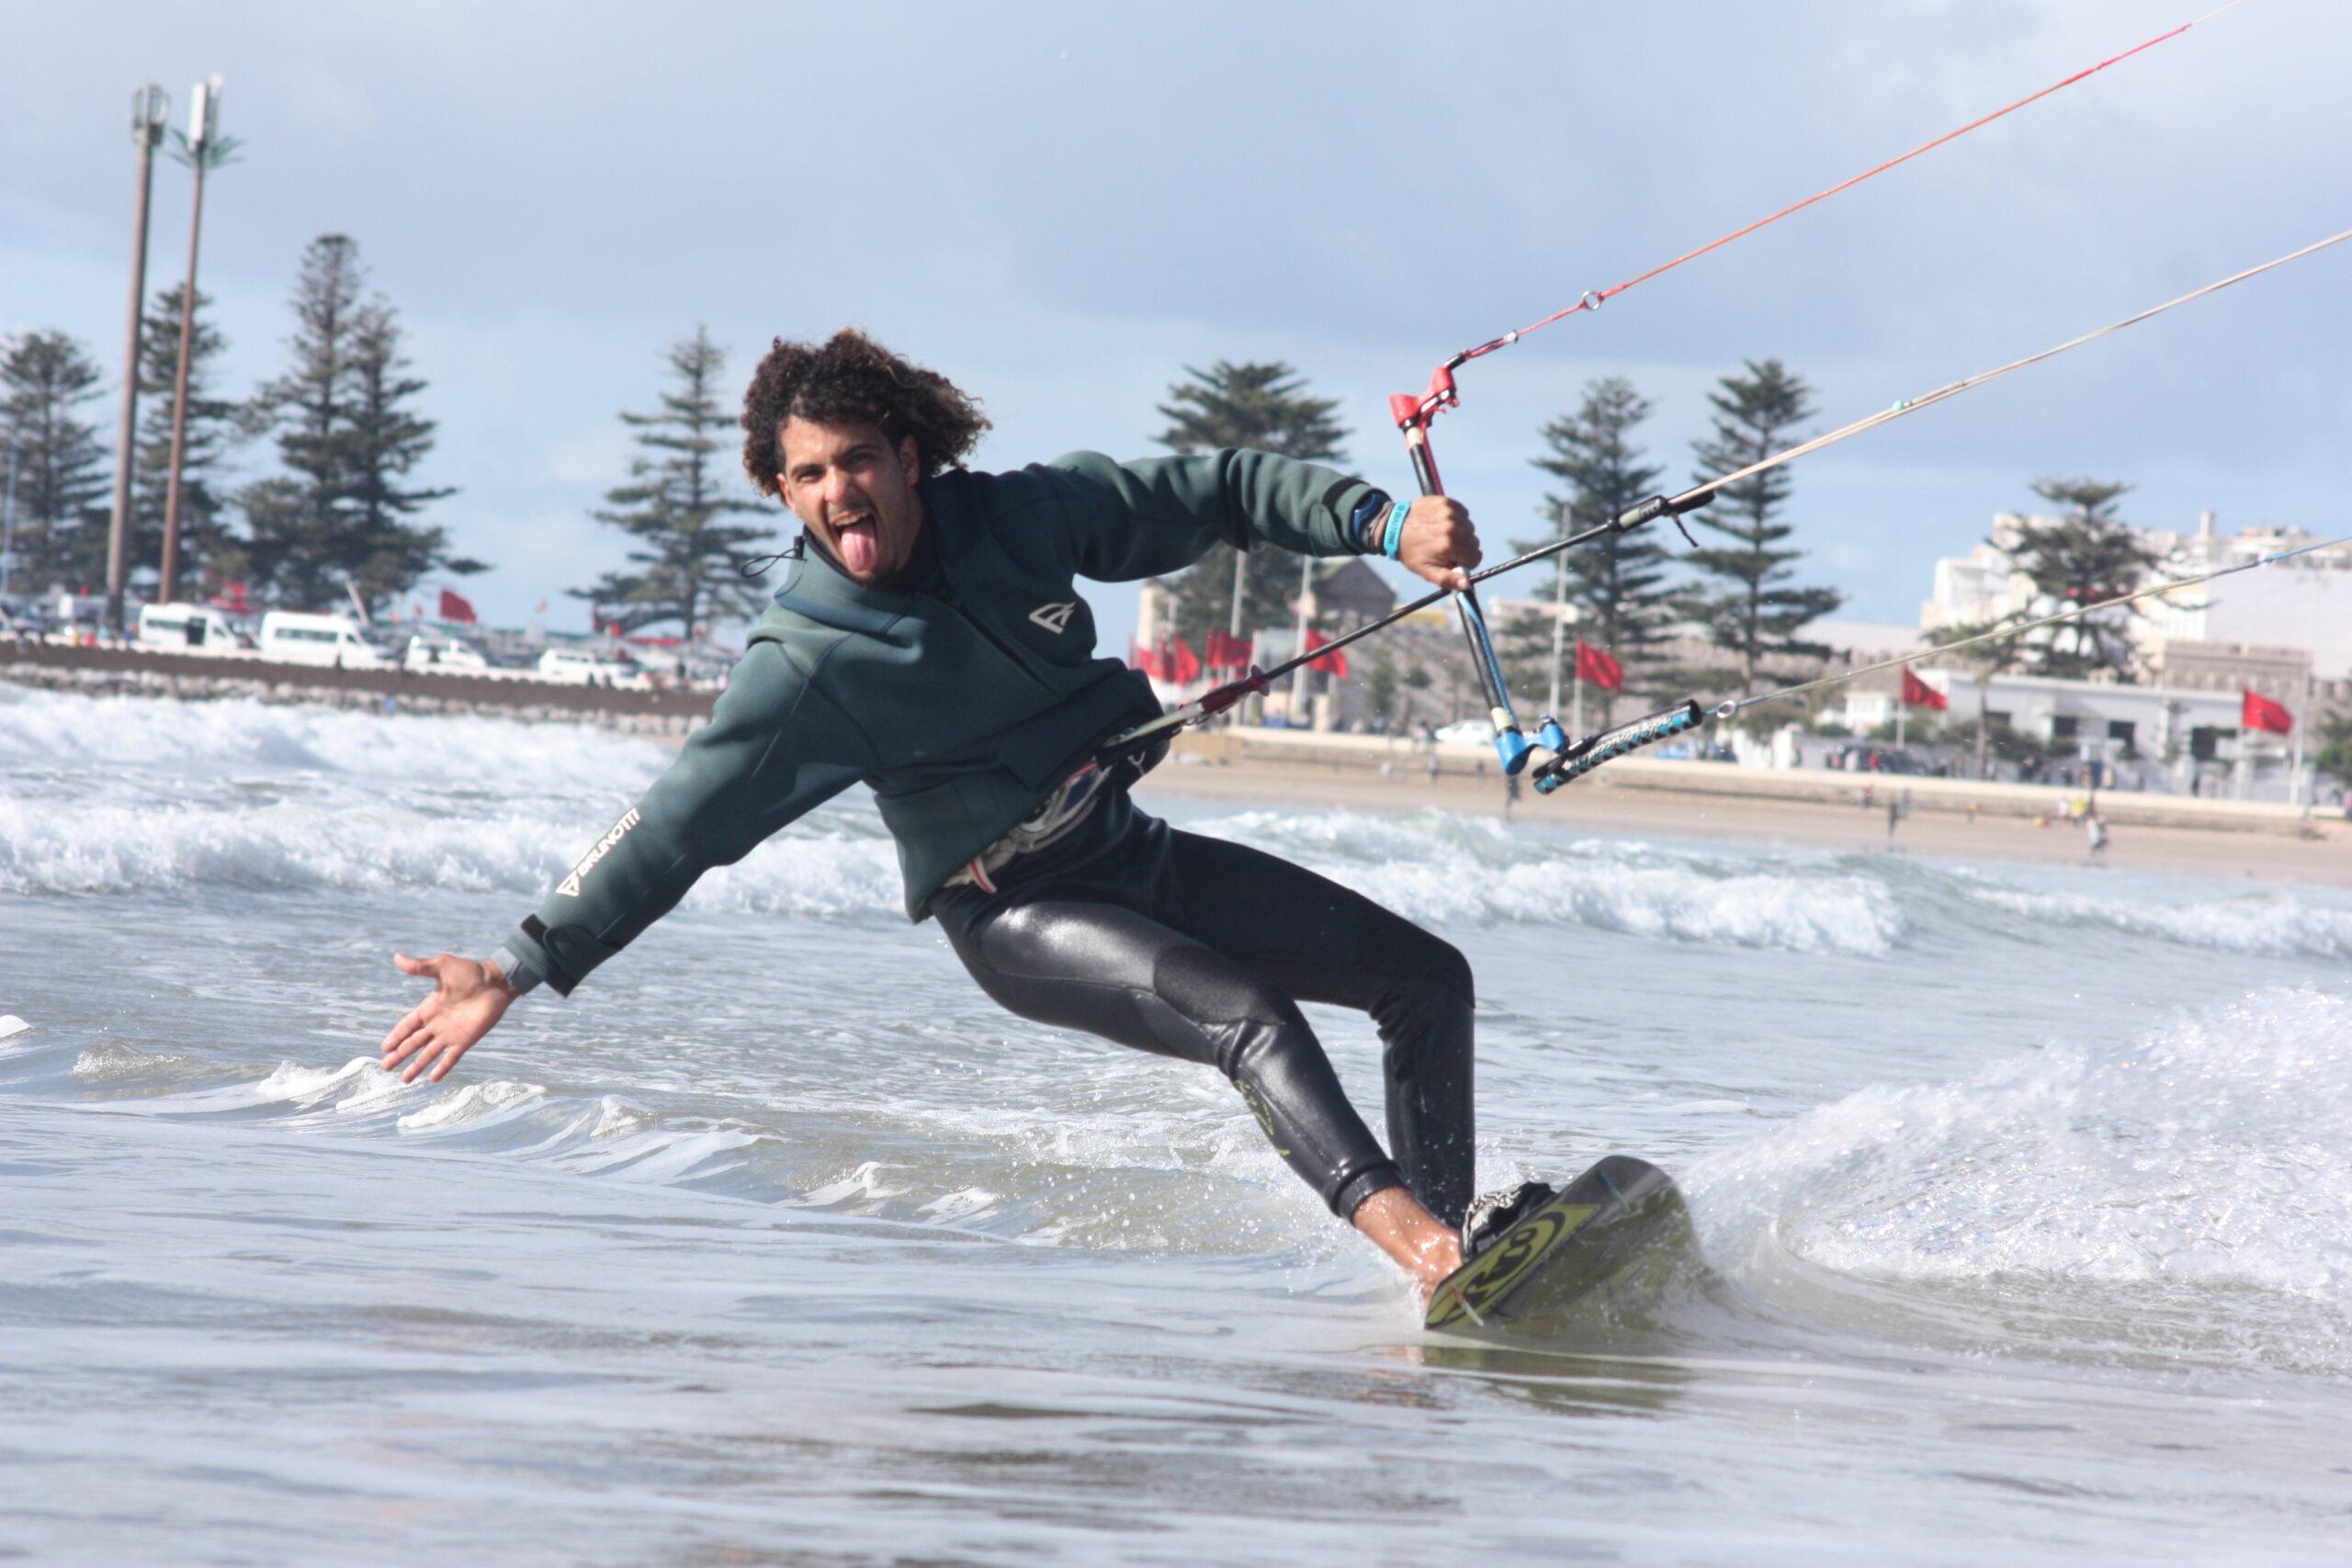 essaouira watersports kitesurf and surf in Essaouira